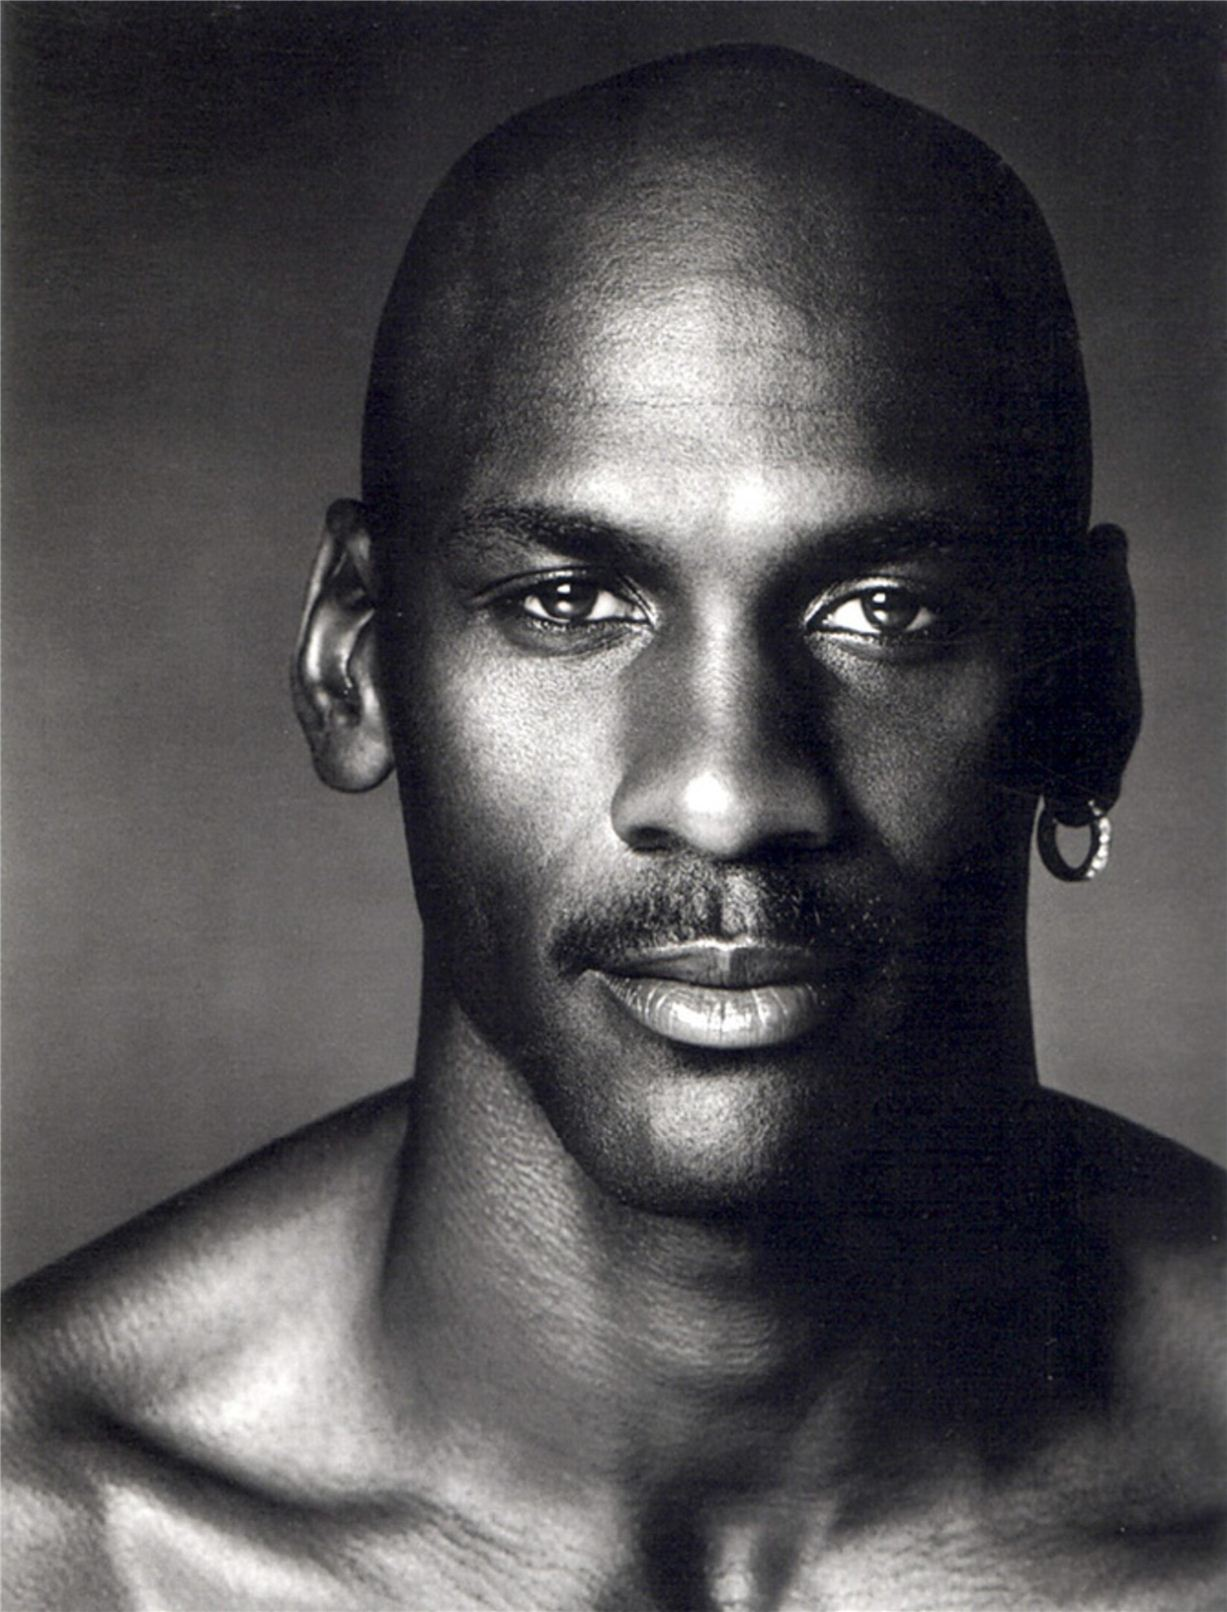 Michael Jordan / Майкл Джордан - портрет фотографа Грега Гормана / Greg Gorman